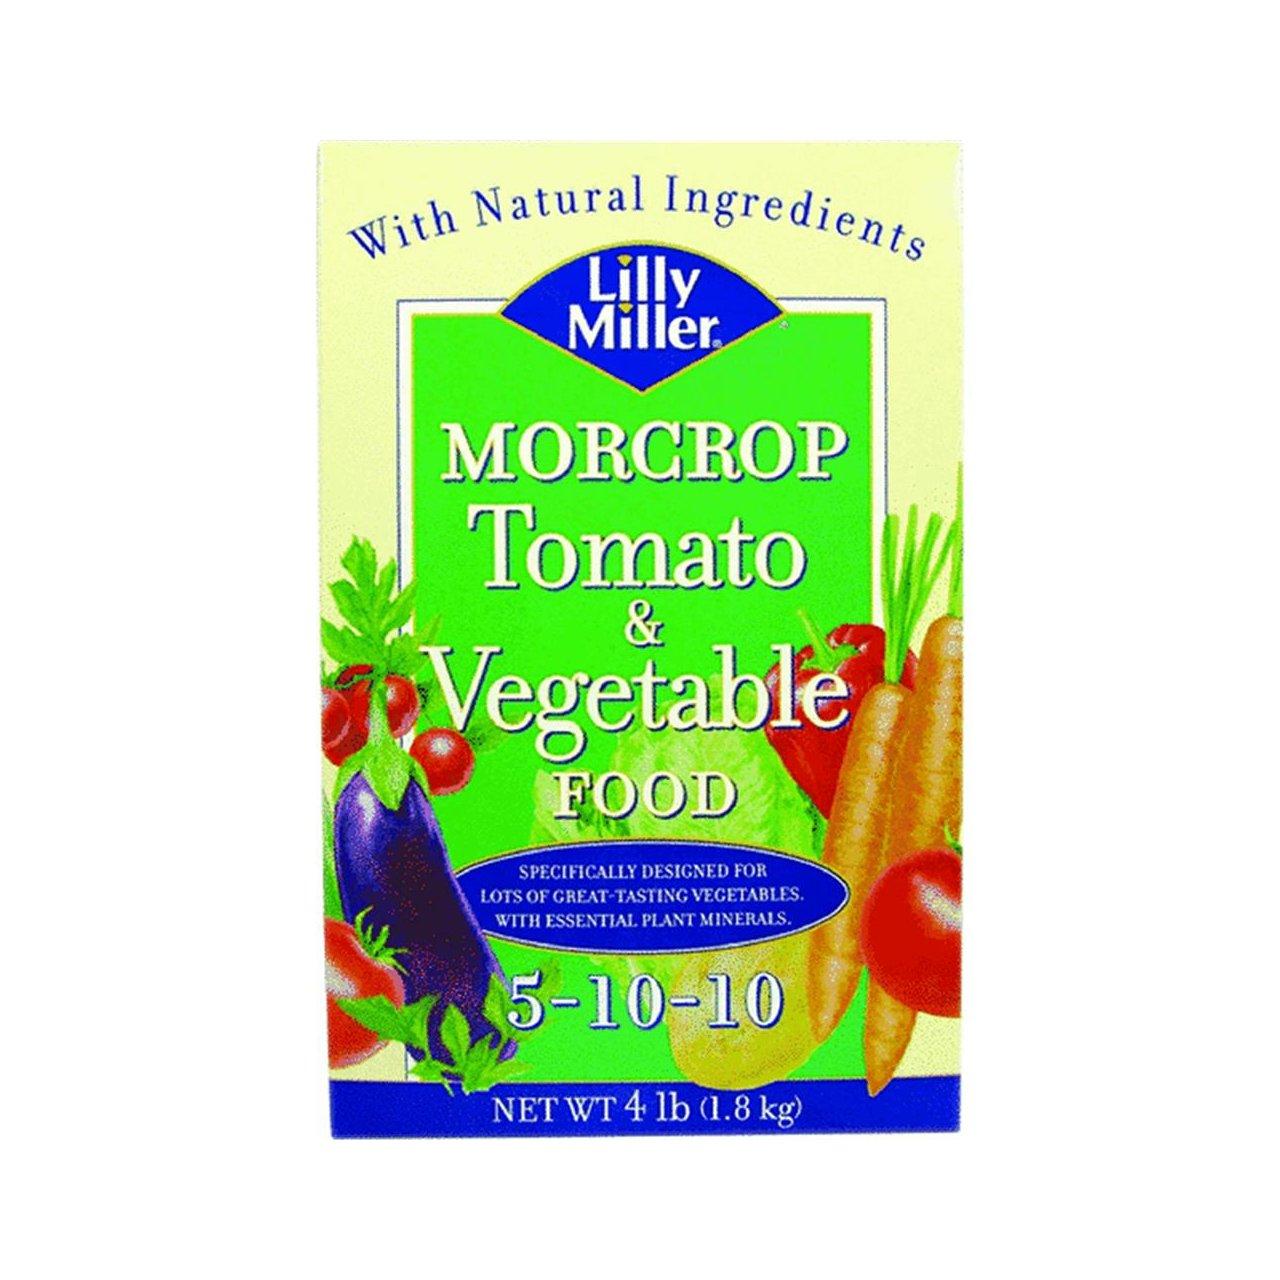 5-10-10 Fertilizer for carrot